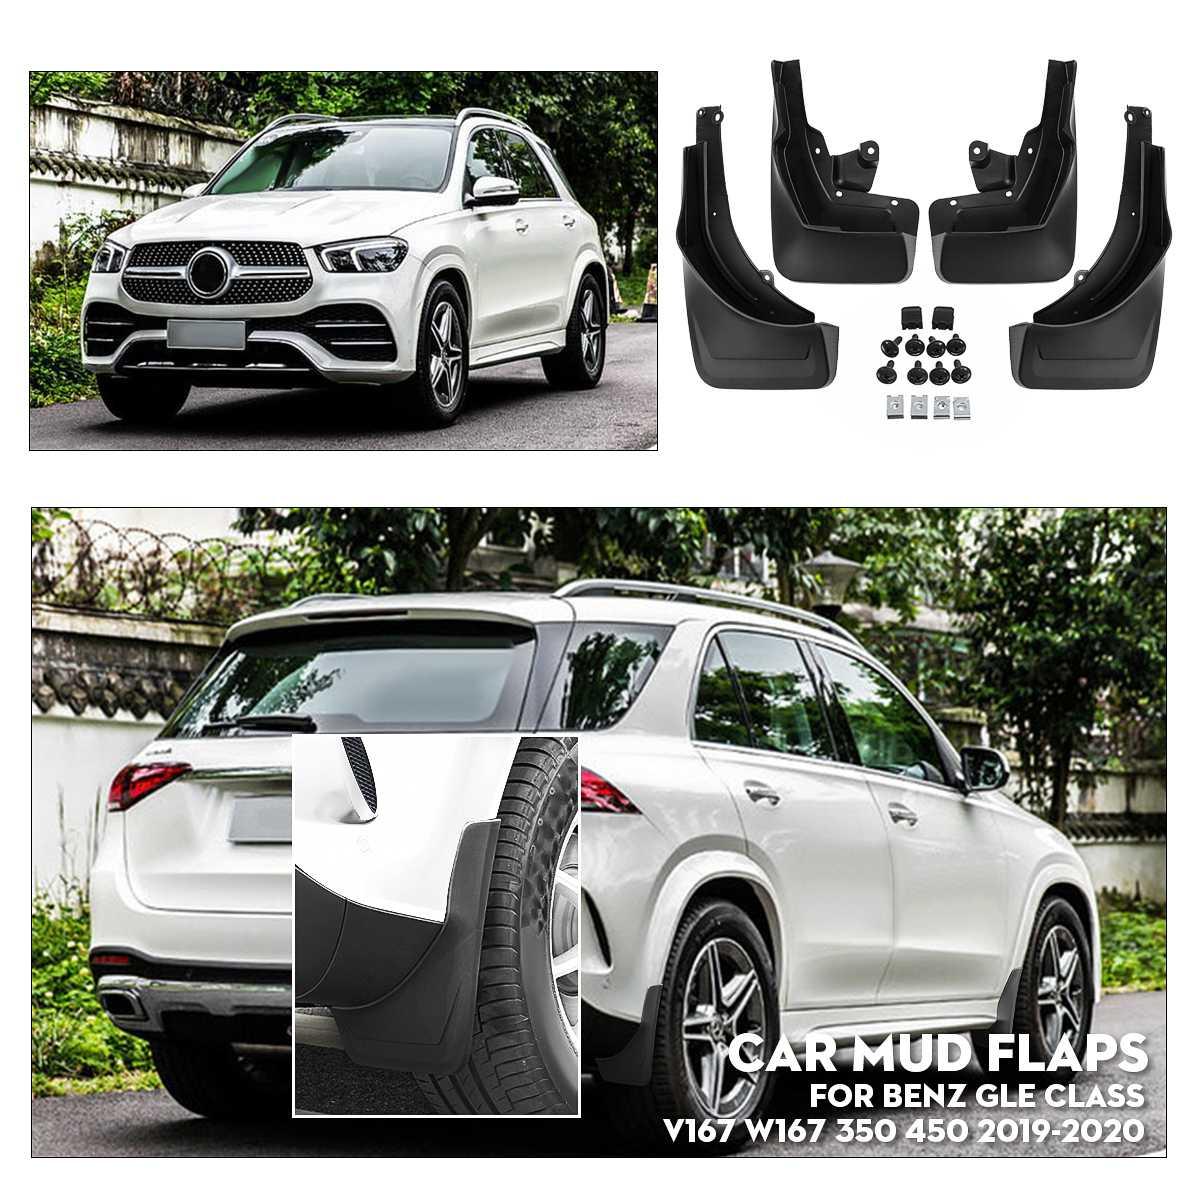 Guardabarros de coche para guardabarros de guardabarros para Mercedes/Benz GLE Class V167 W167 350 450 2019-2020